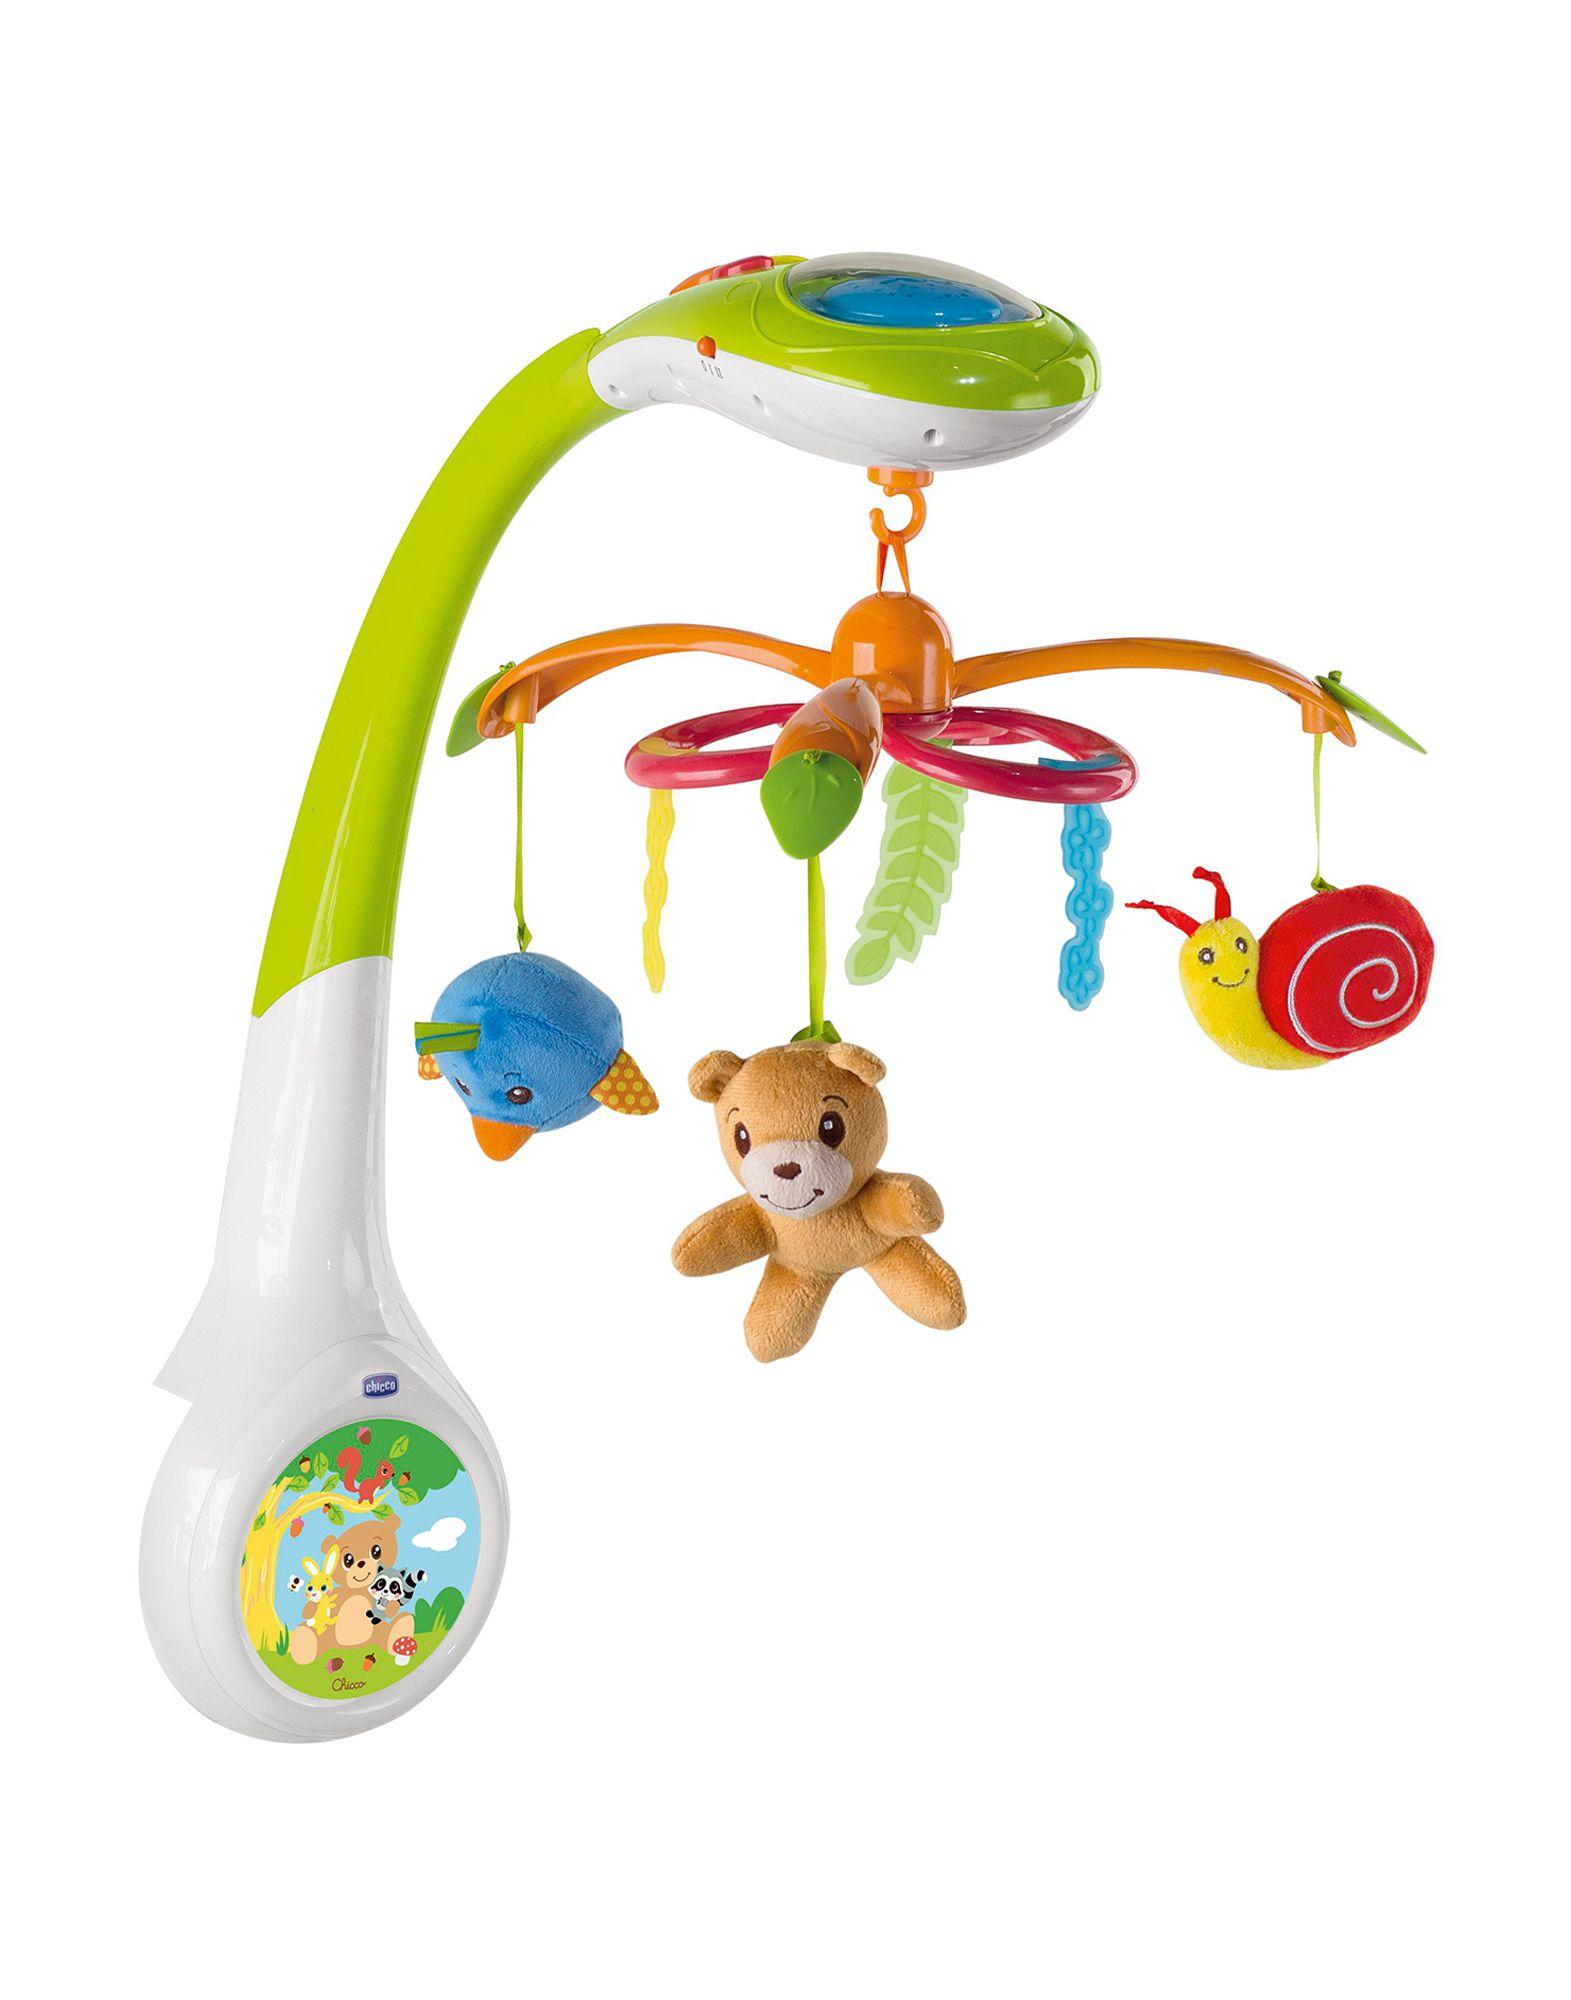 CHICCO Игрушки для малышей игрушки для ванны chicco счастливый бегемотик